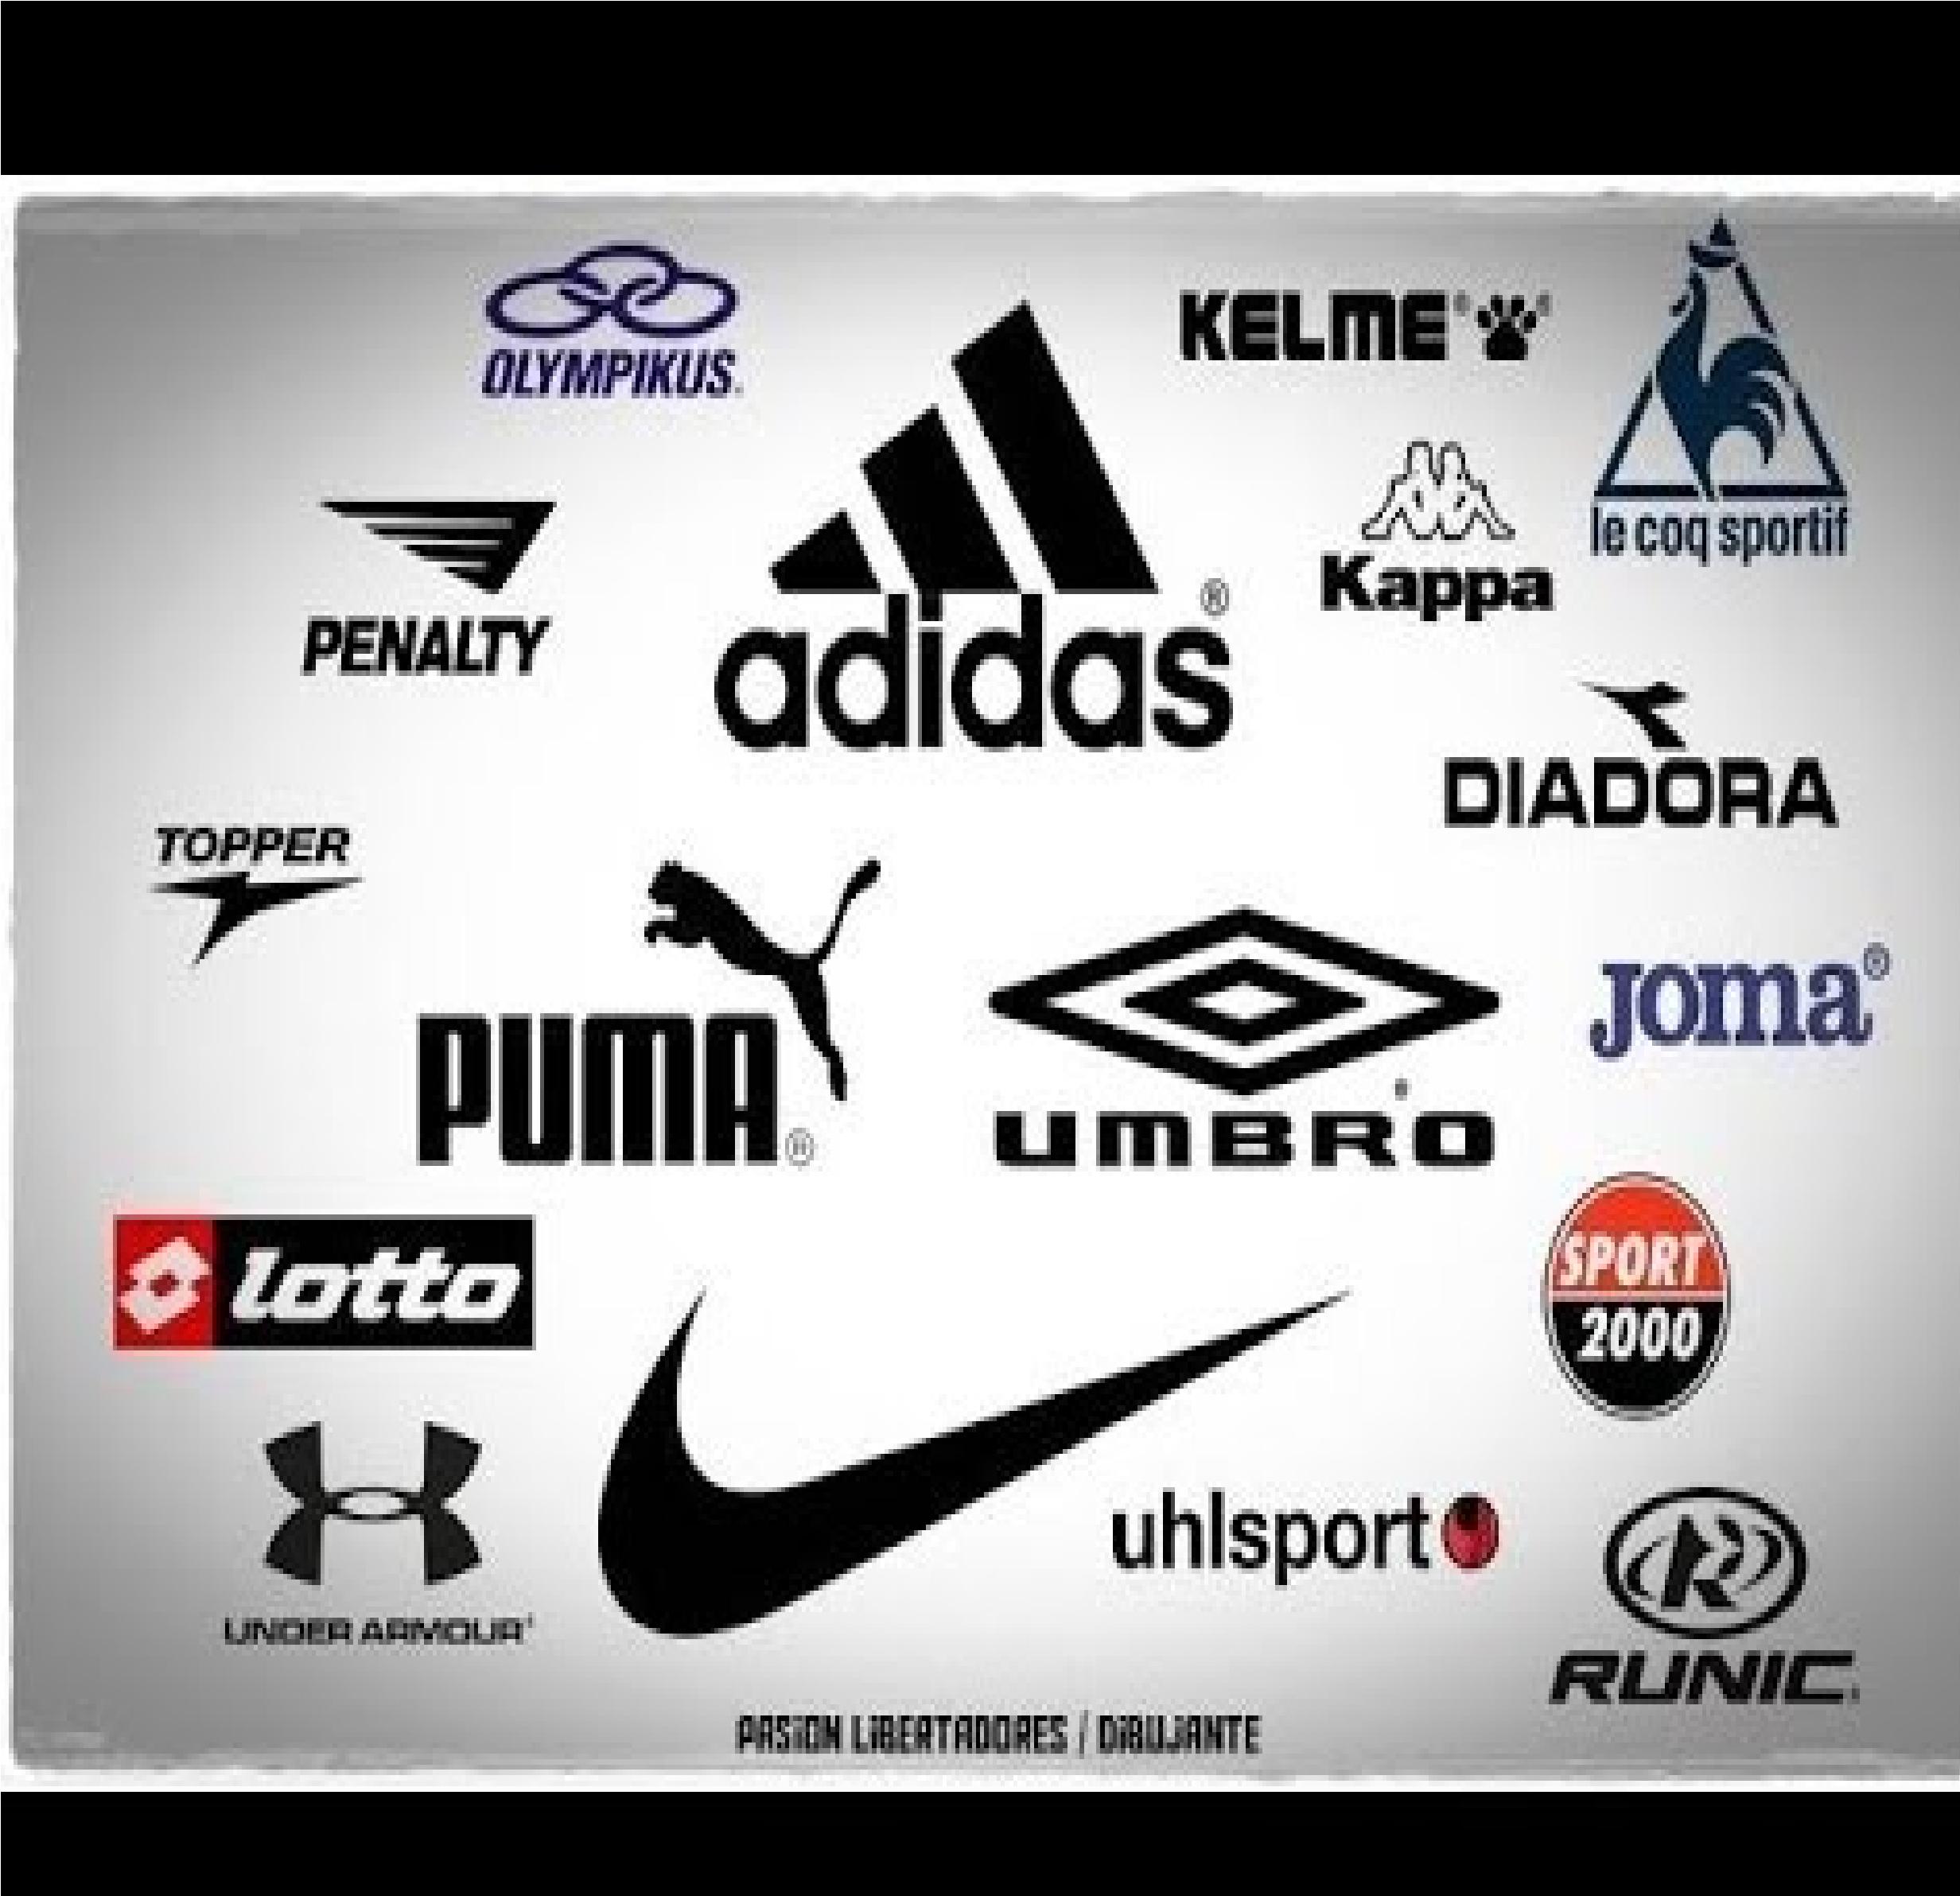 e6d4ca5e2f Las mejores marcas de zapatos deportivos para hombres